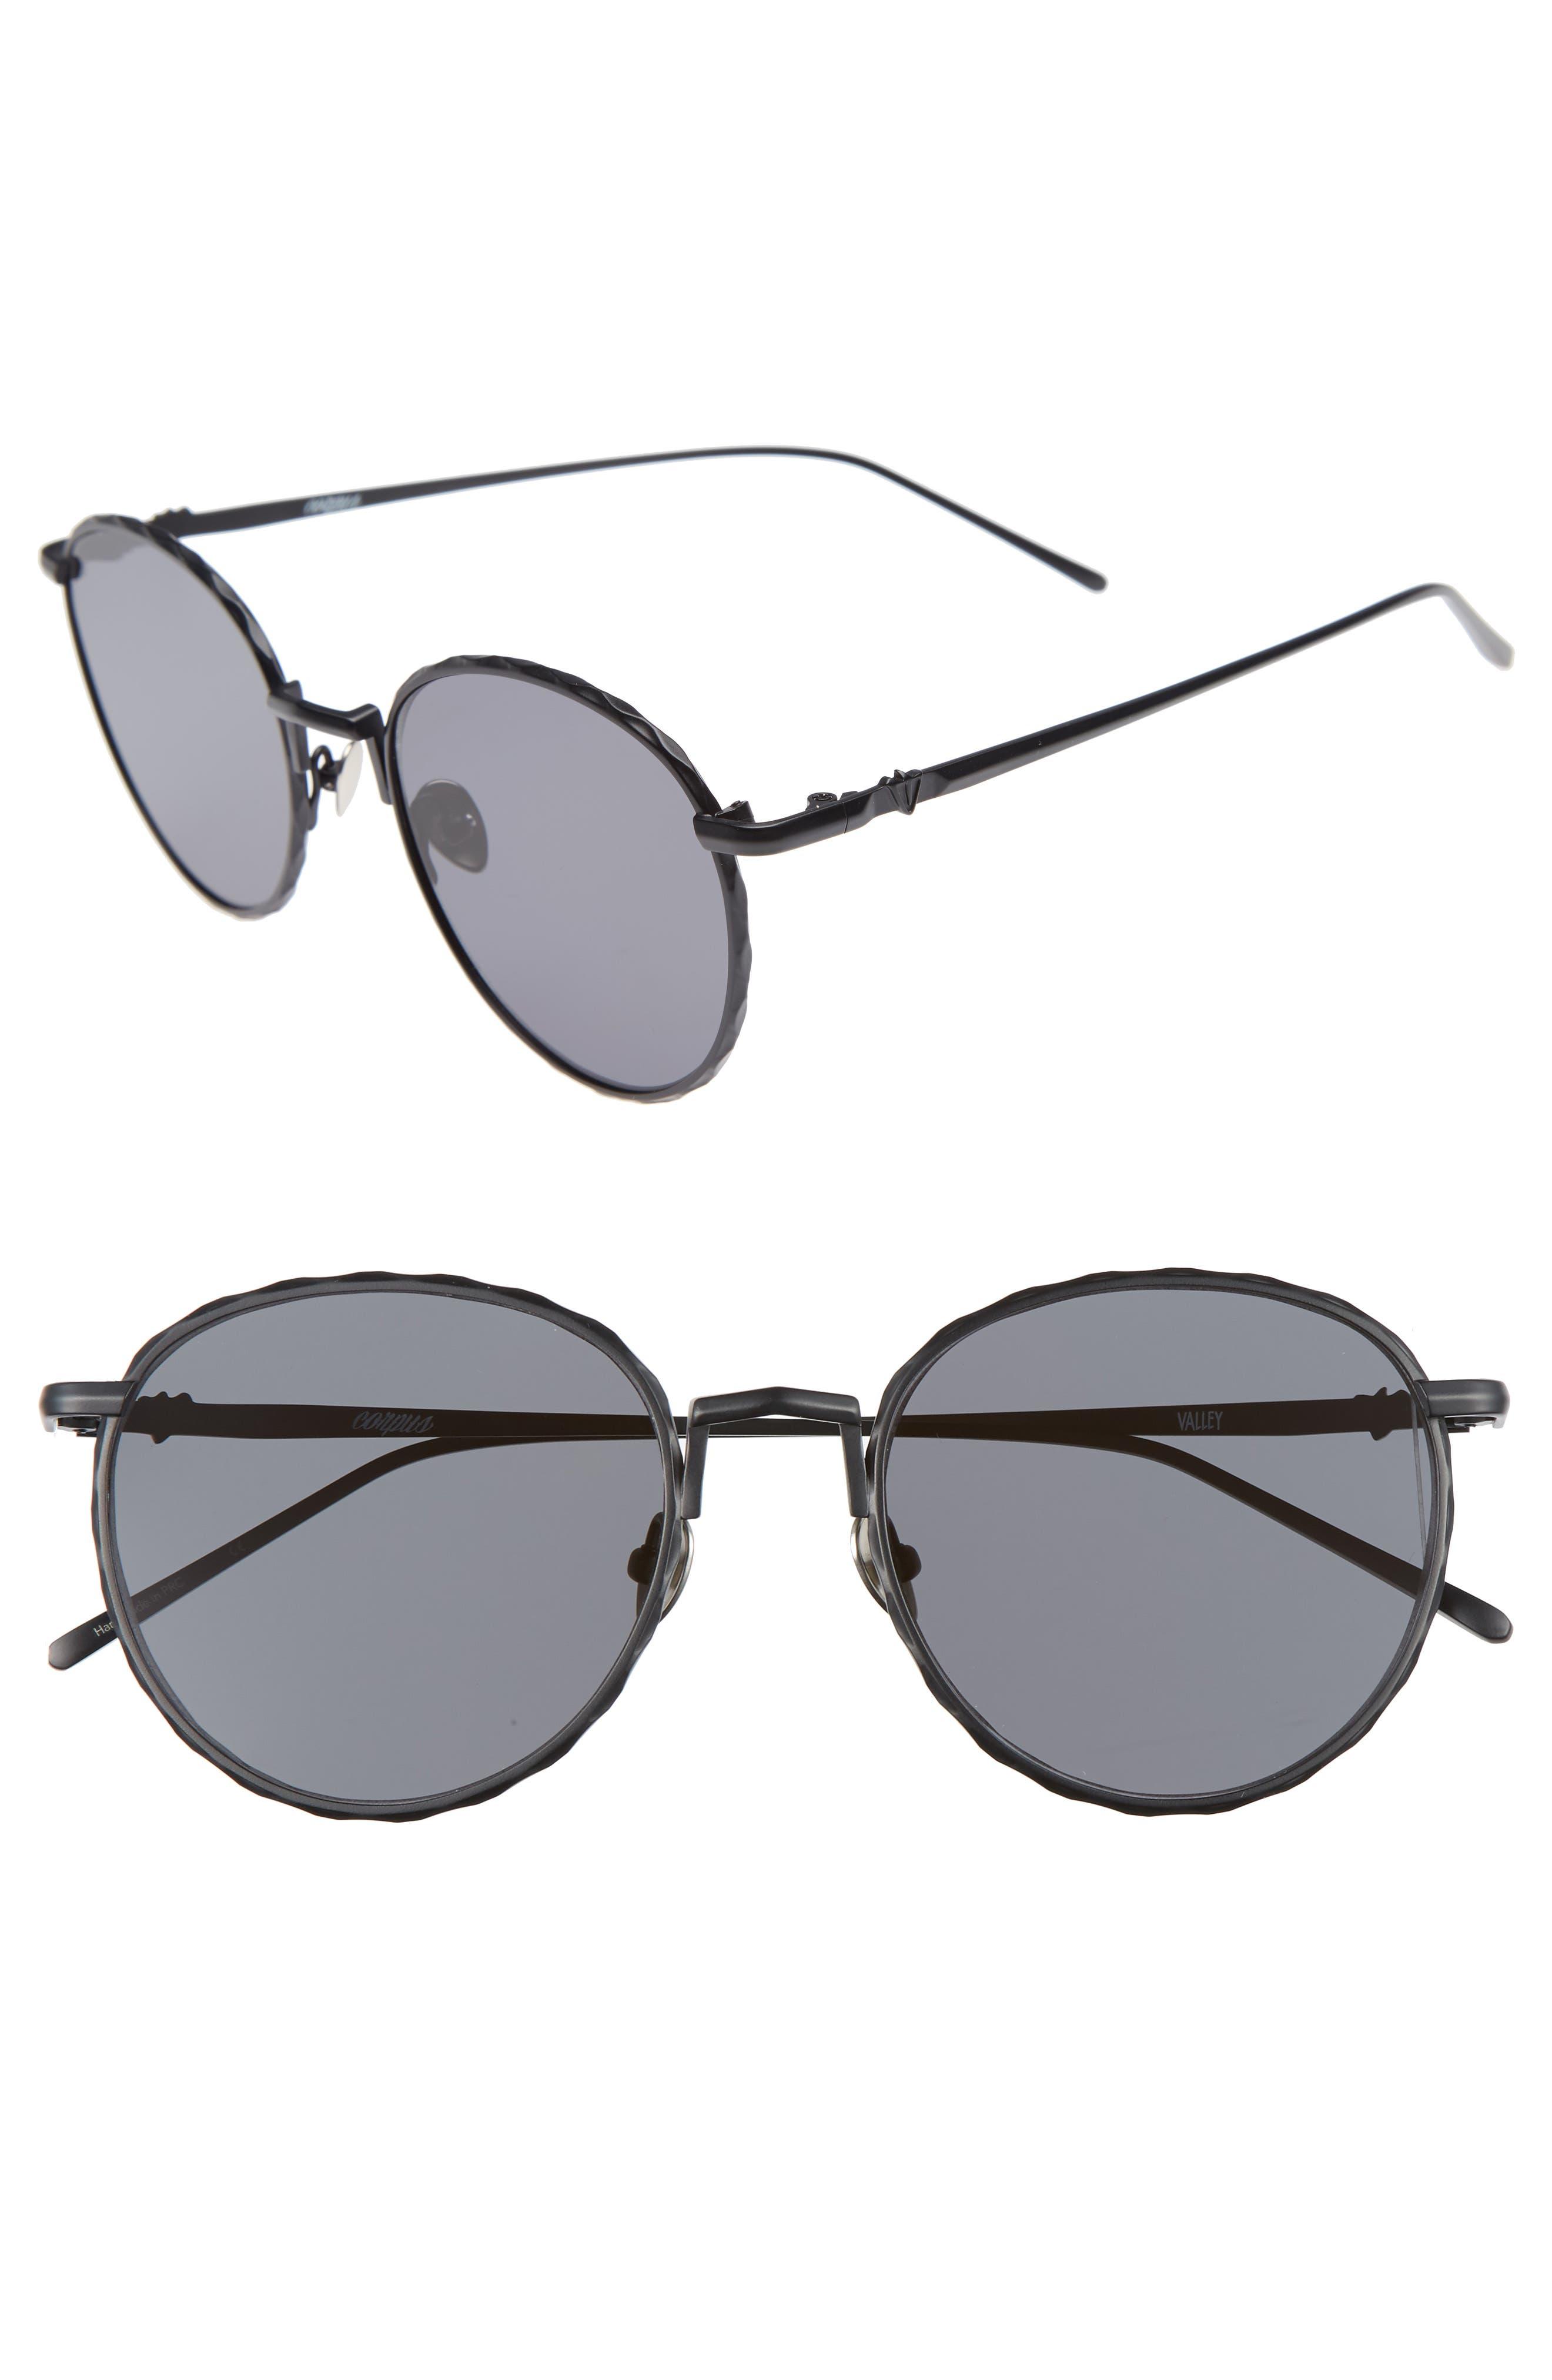 Corpus 53mm Round Sunglasses,                             Alternate thumbnail 2, color,                             001